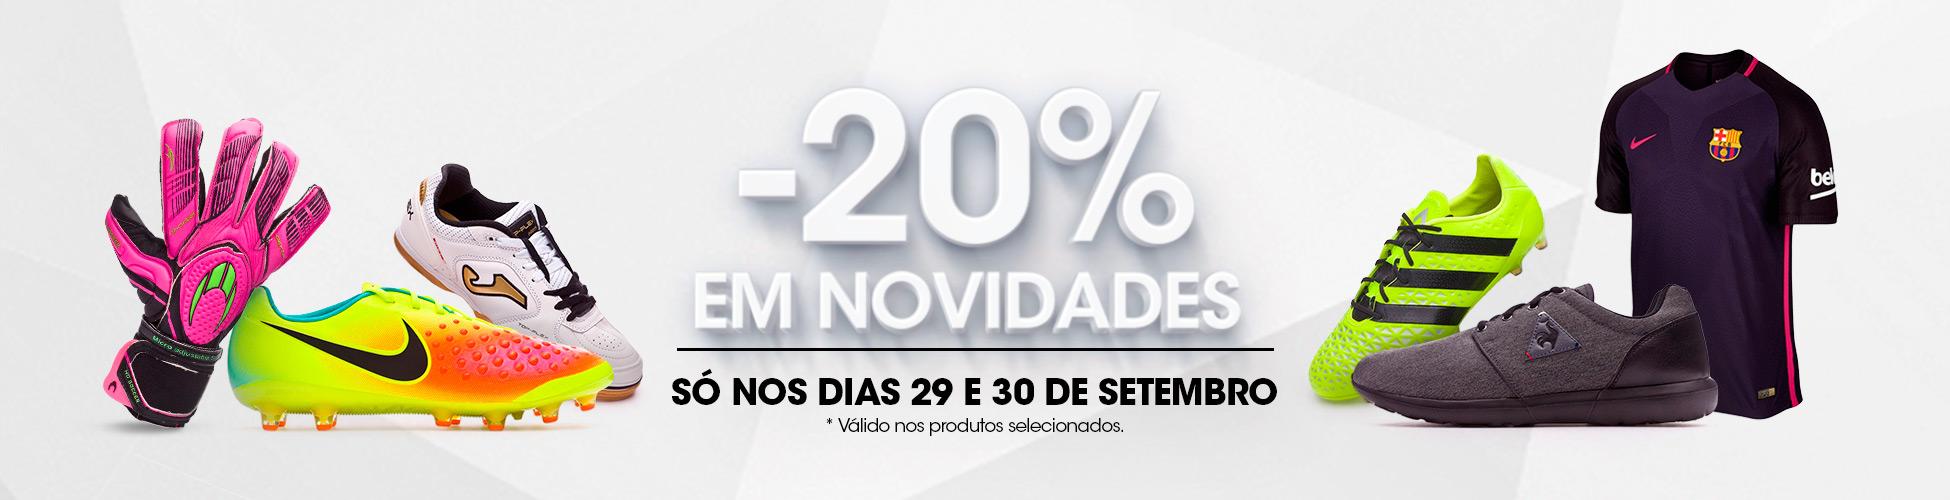 20% Novedades Guantes 30/09 PT